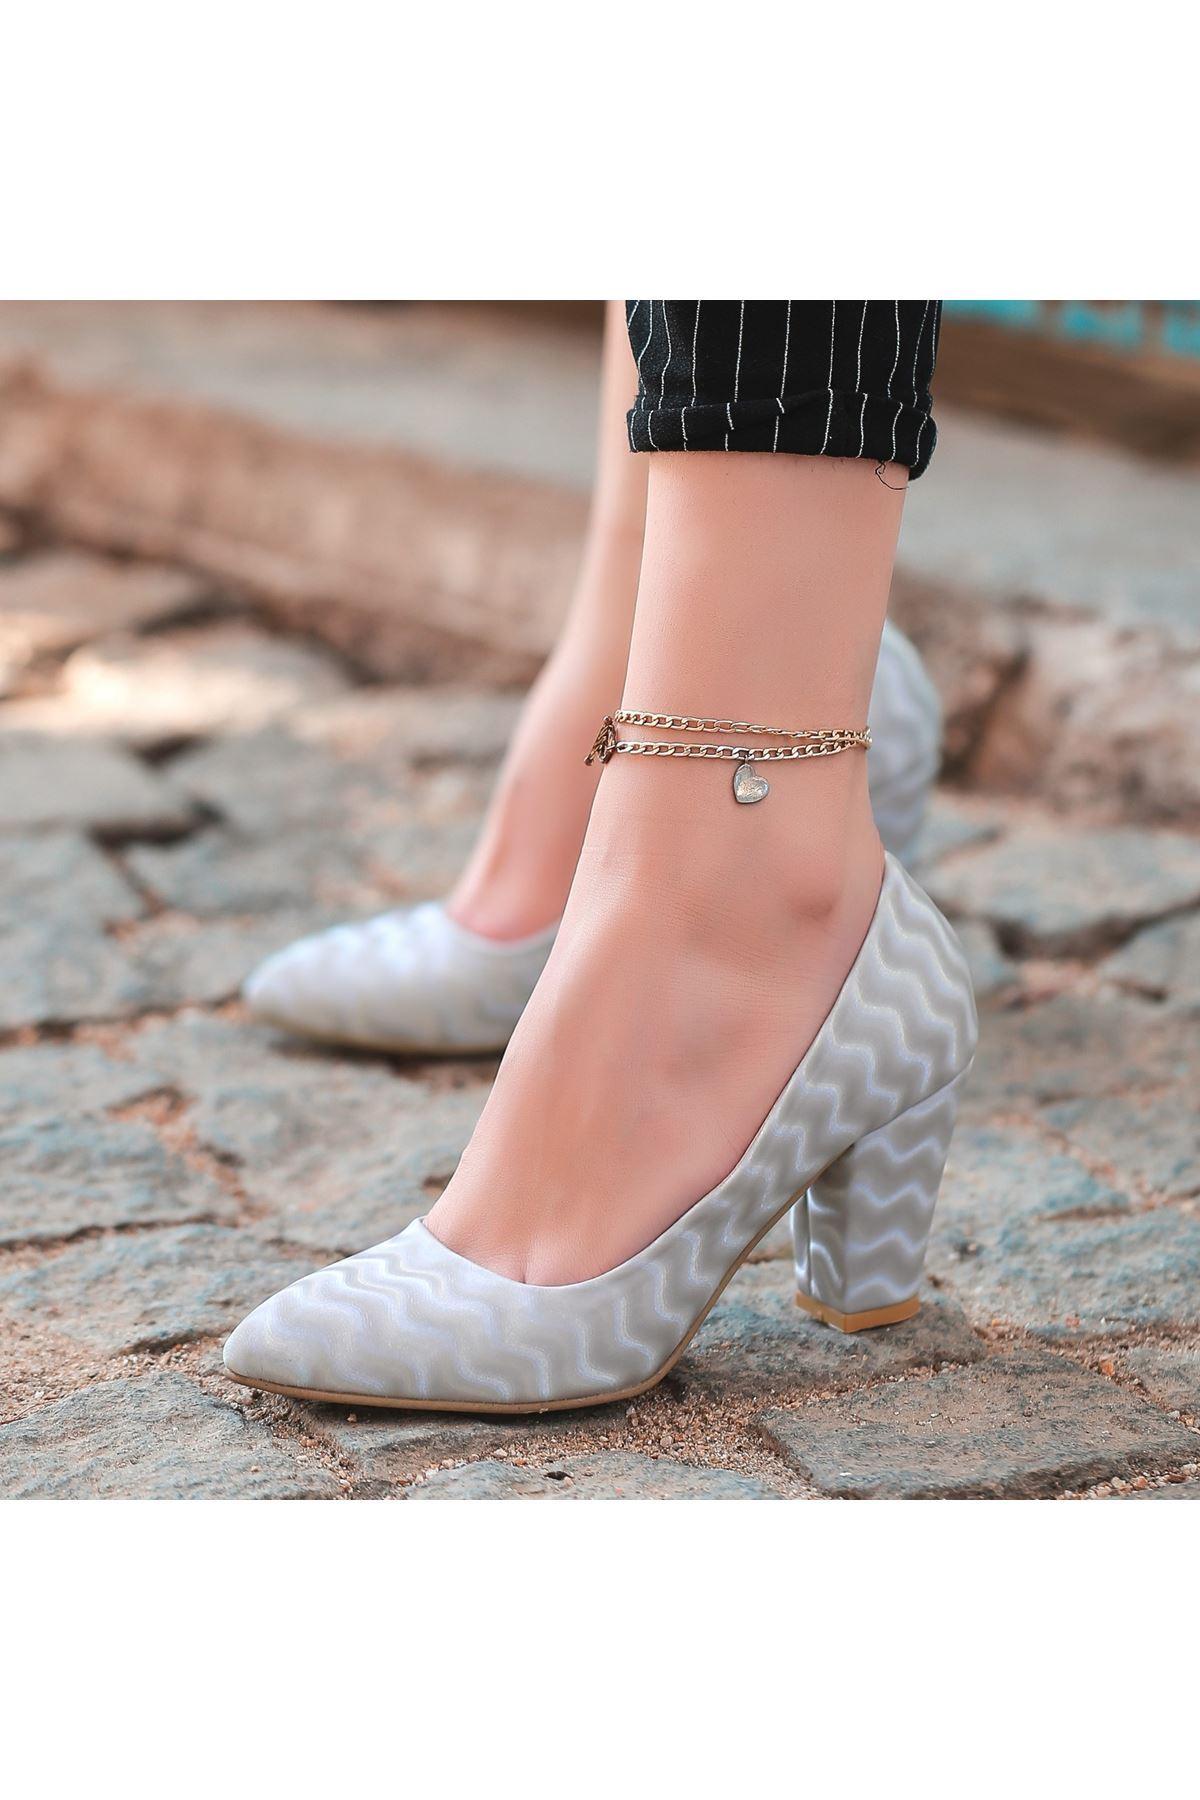 Mior Gri Süet Desenli Topuklu Ayakkabı